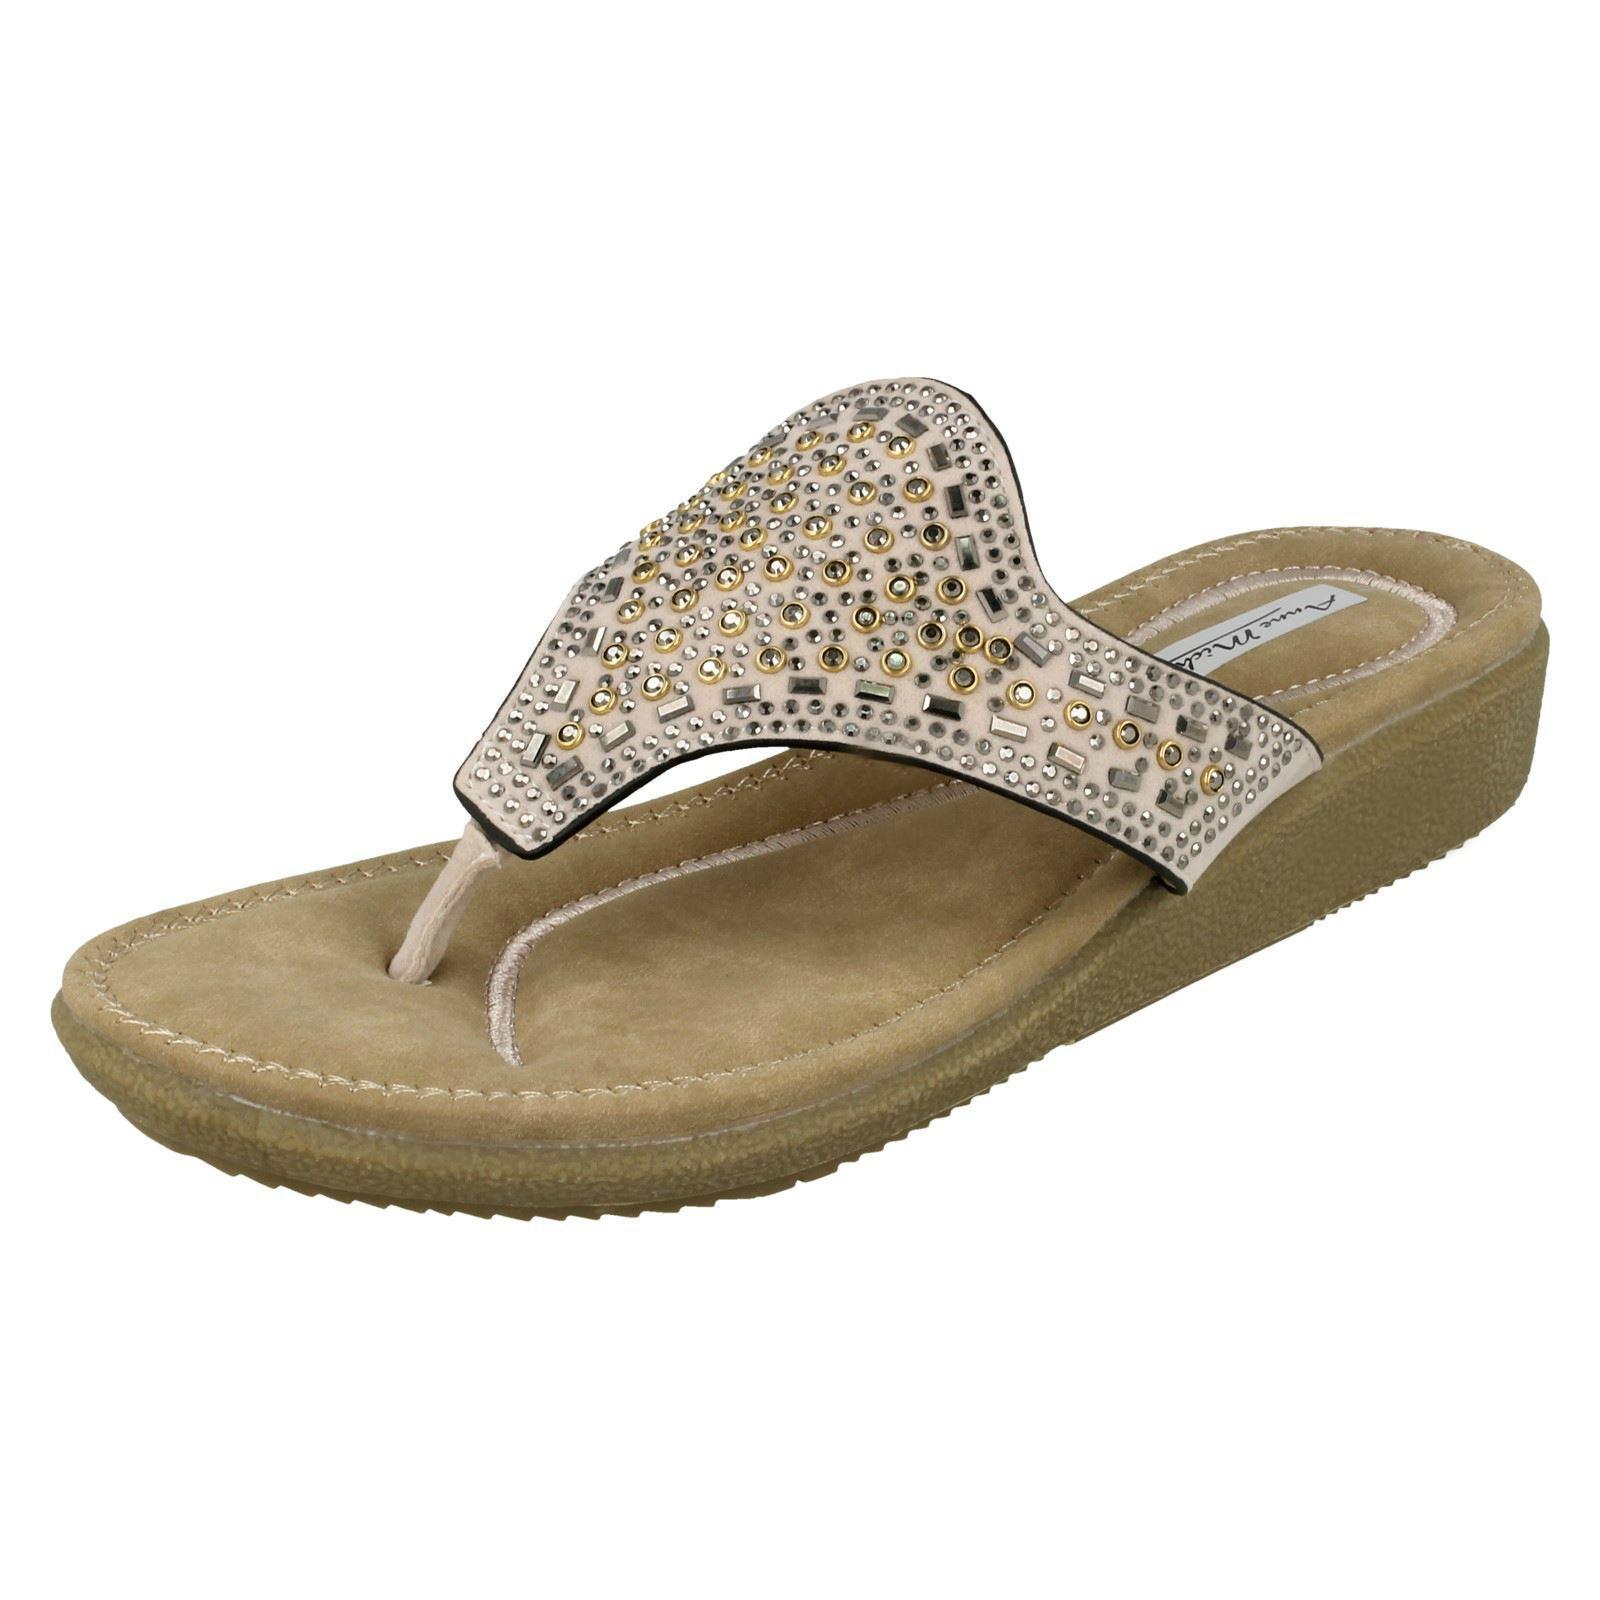 Anne Michelle Ladies Toe Detail Post Sandal - Embellishment Detail Toe 255f87